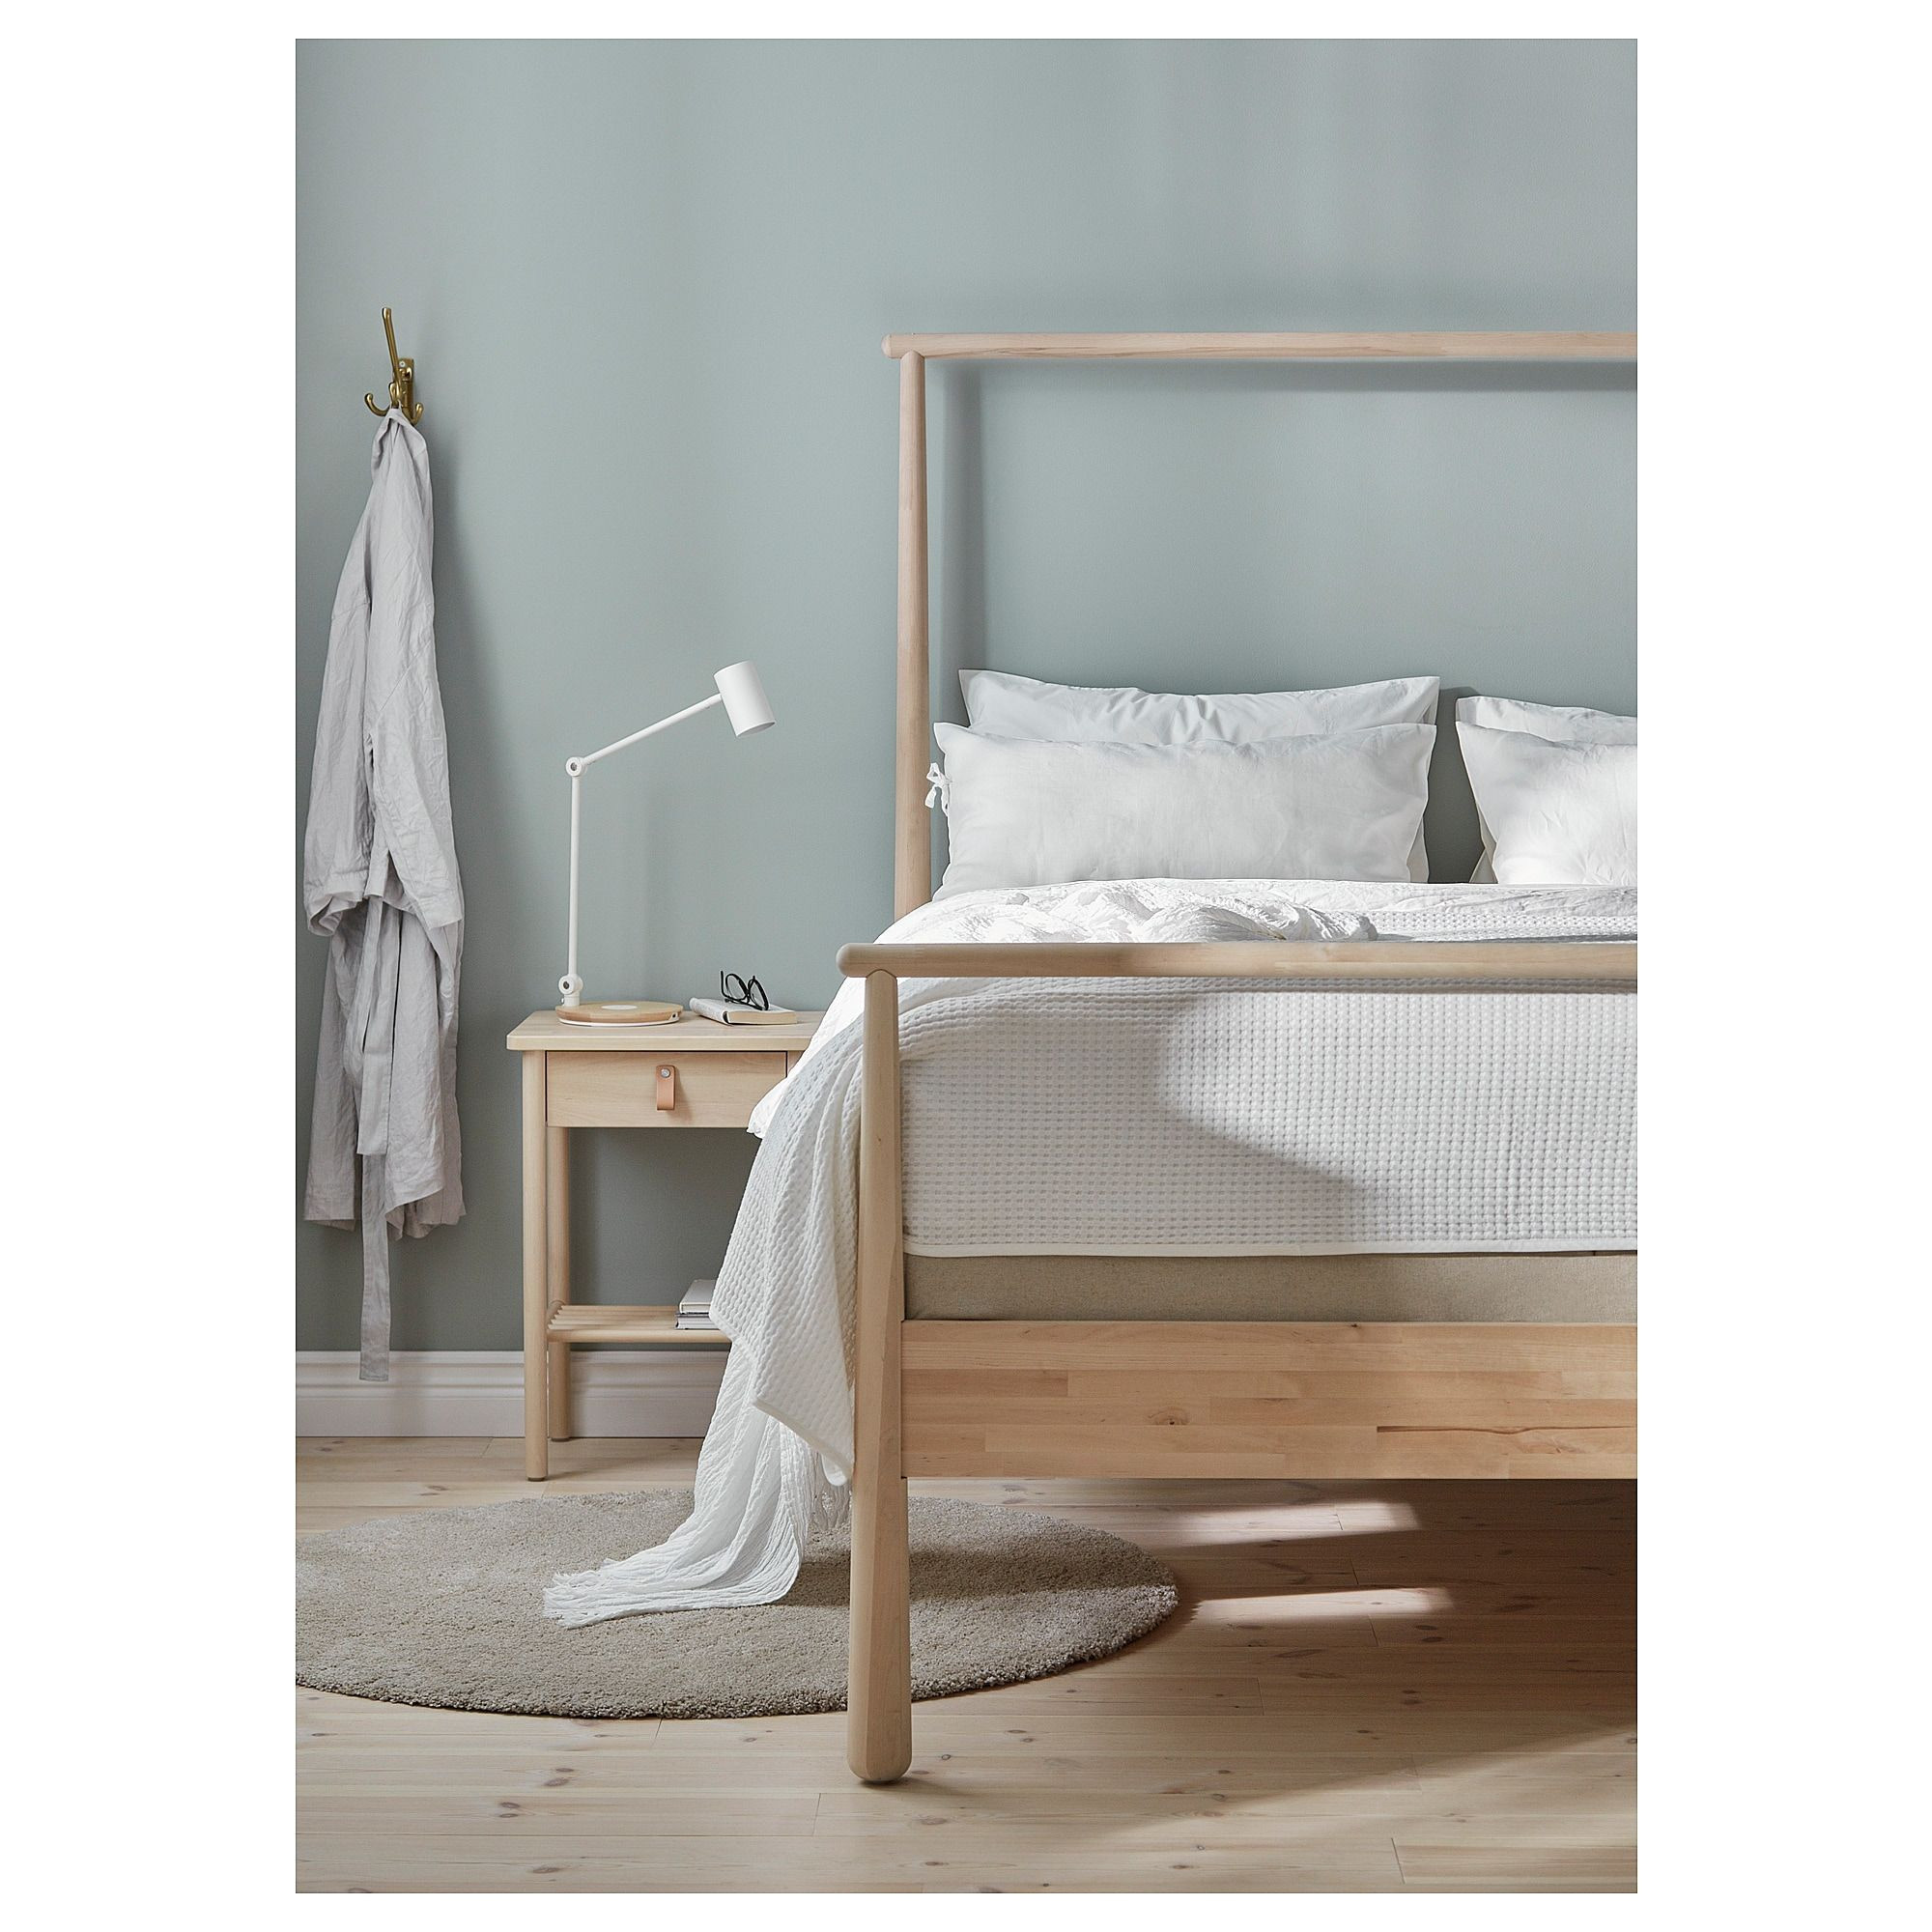 gja ra bed frame queen luroy slatted bed base ikea